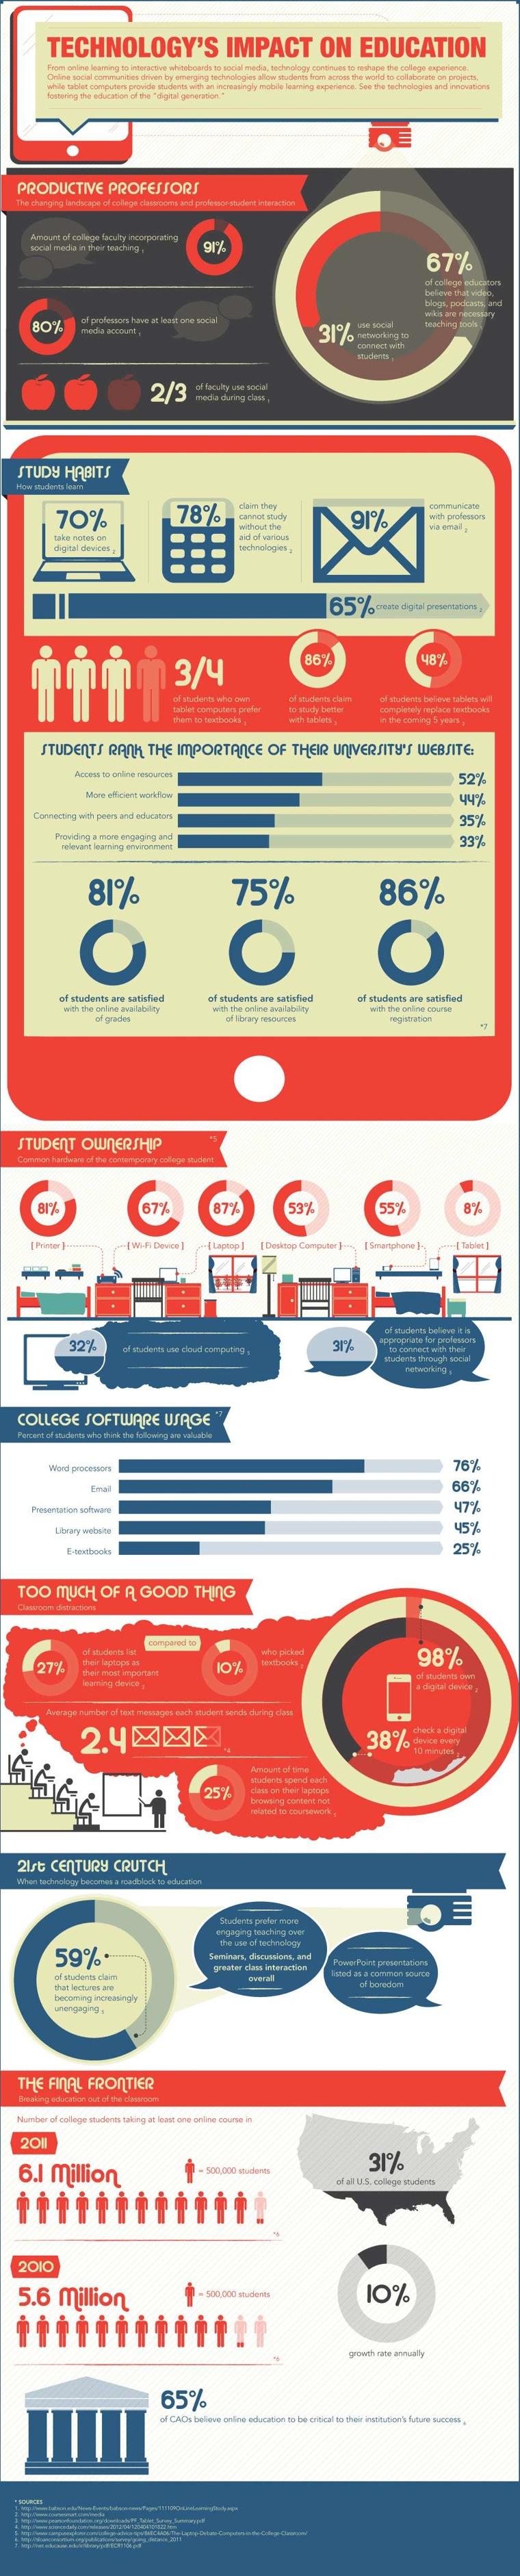 Technology's Pervasive Impact on Higher Education # ...